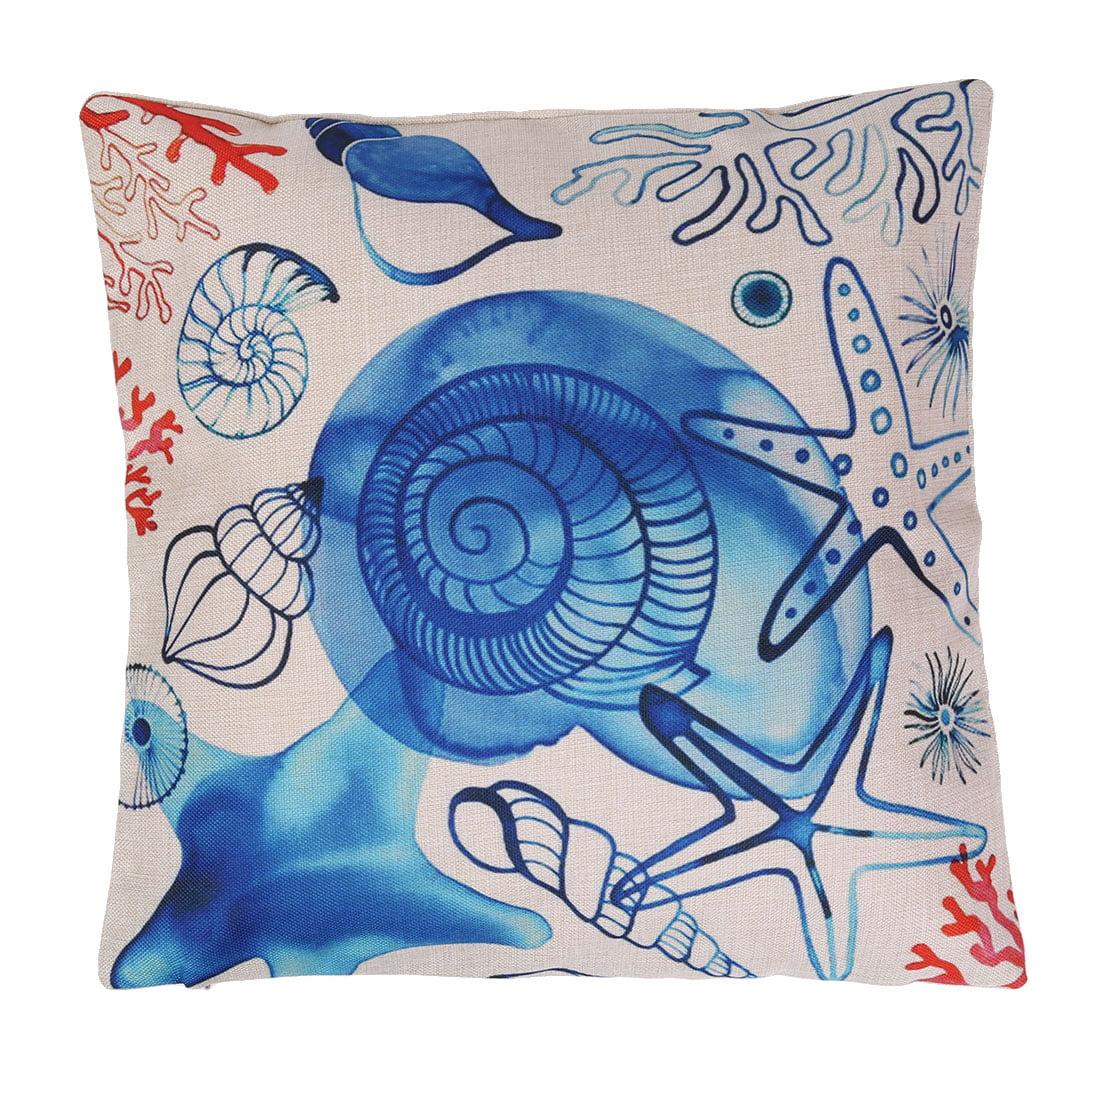 Unique BargainsHome Cotton Linen Conch Coral Print Back Pillow Cushion Pad Cover 18 x 18 Inches